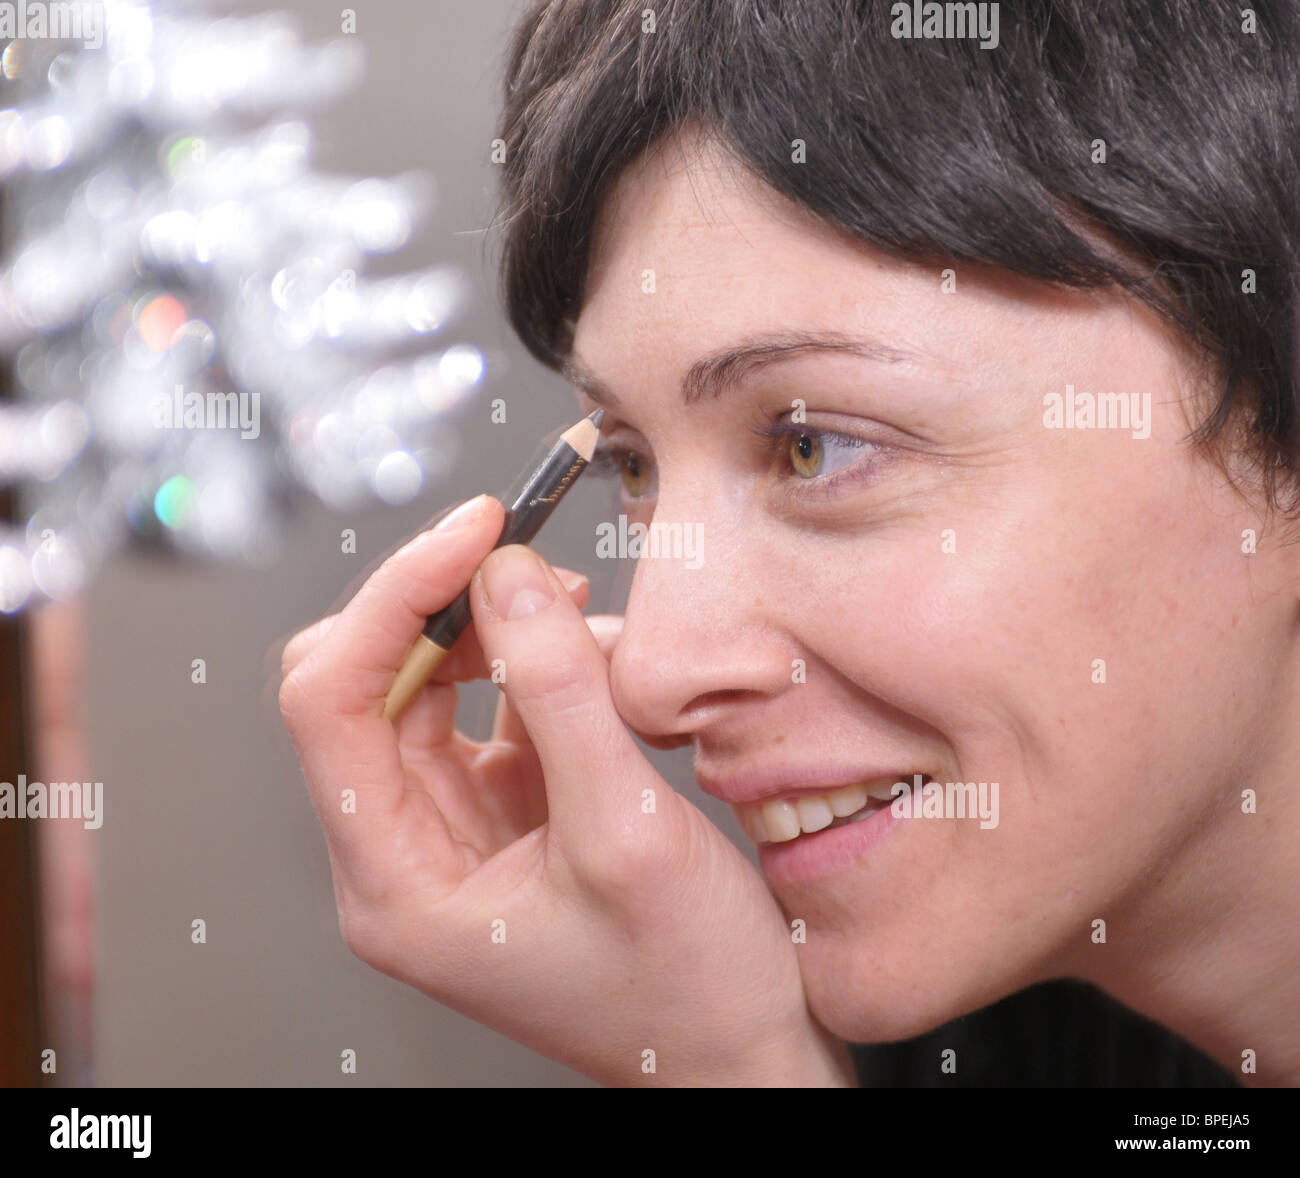 Actress Ksenia Rappoport - Stock Image